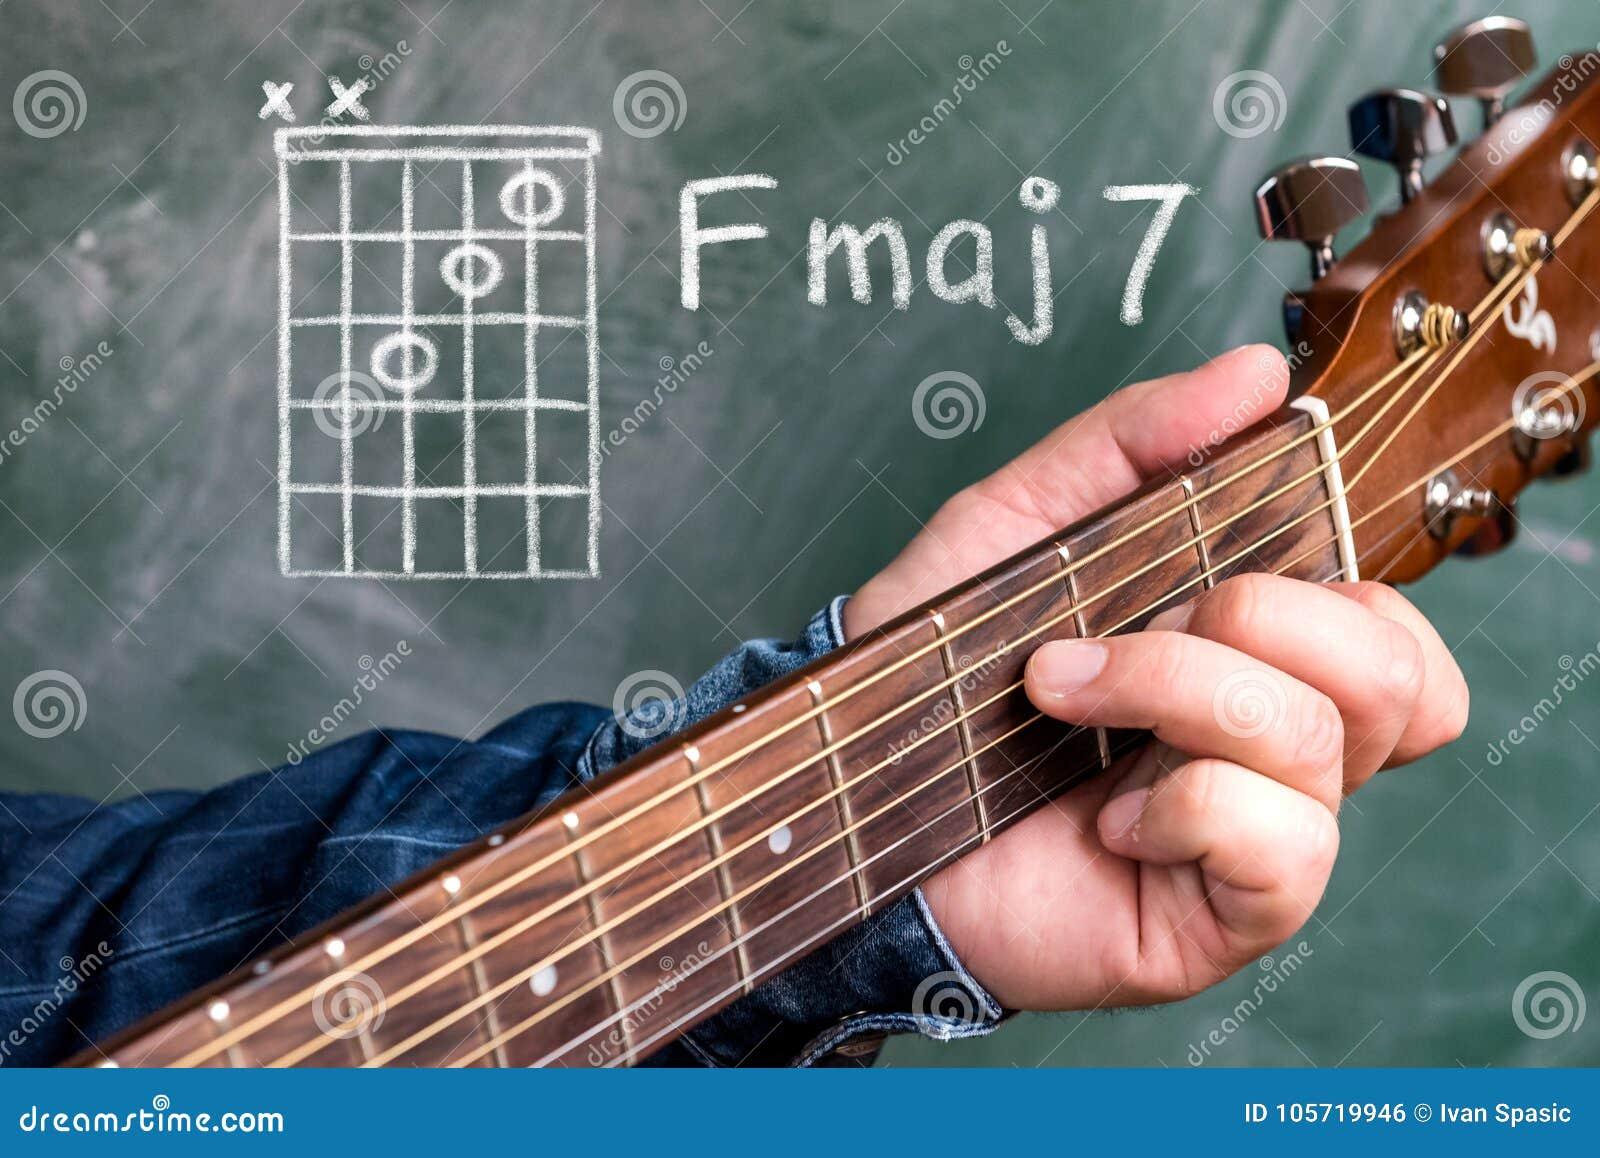 Man Playing Guitar Chords Displayed On A Blackboard Chord F Major 7